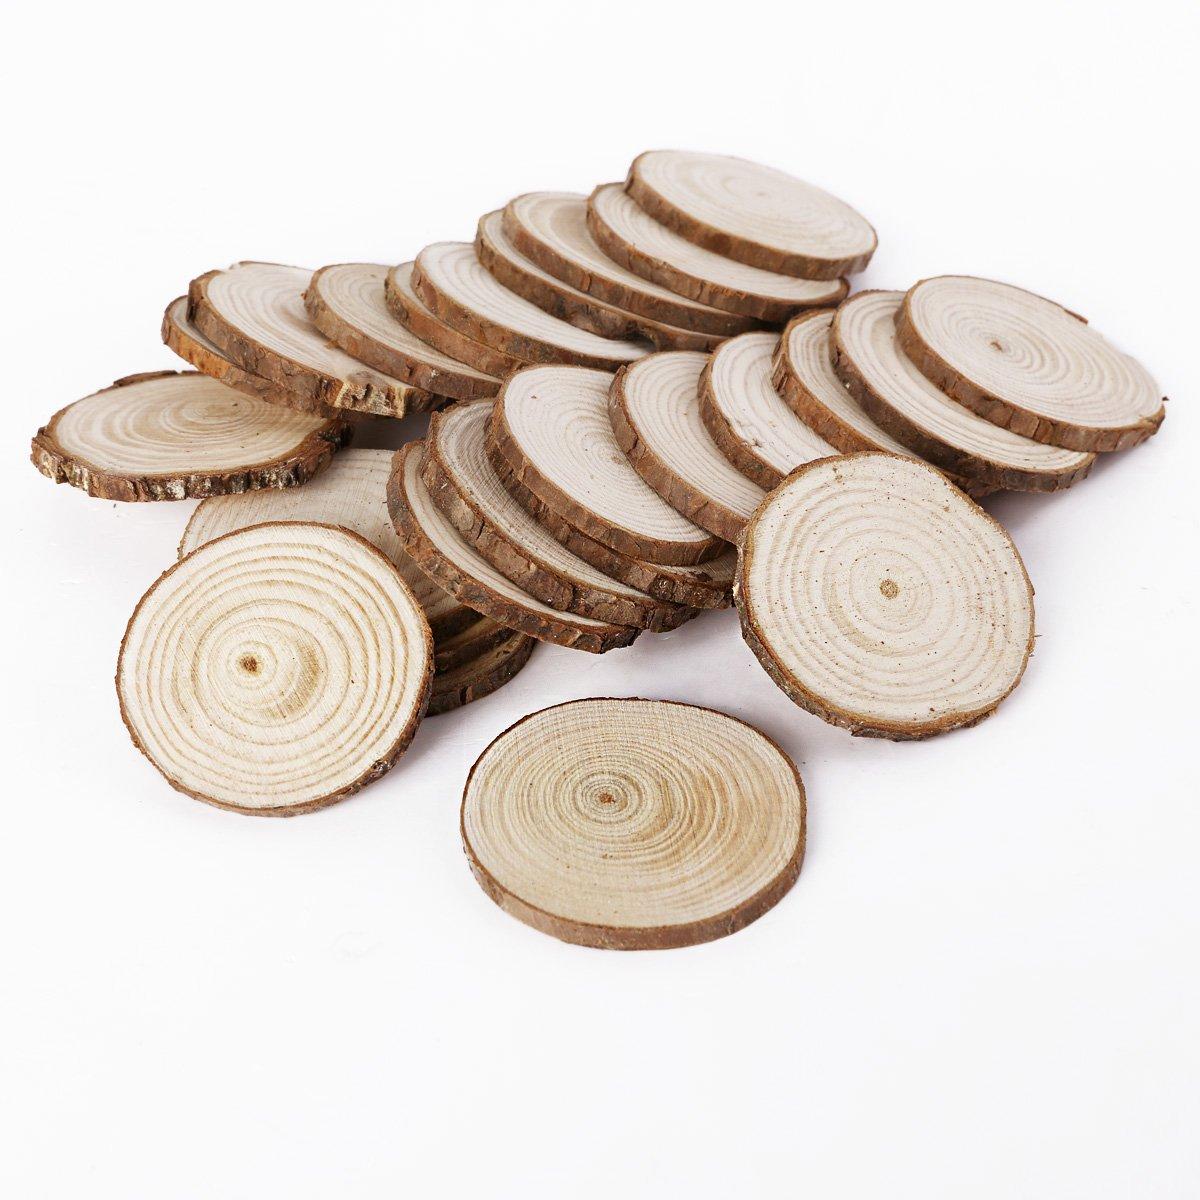 Round Shape SurePromise 25PCS 5CM Wooden Wood Log Slices Discs Natural Tree Bark Table Decorative Wedding Centerpieces